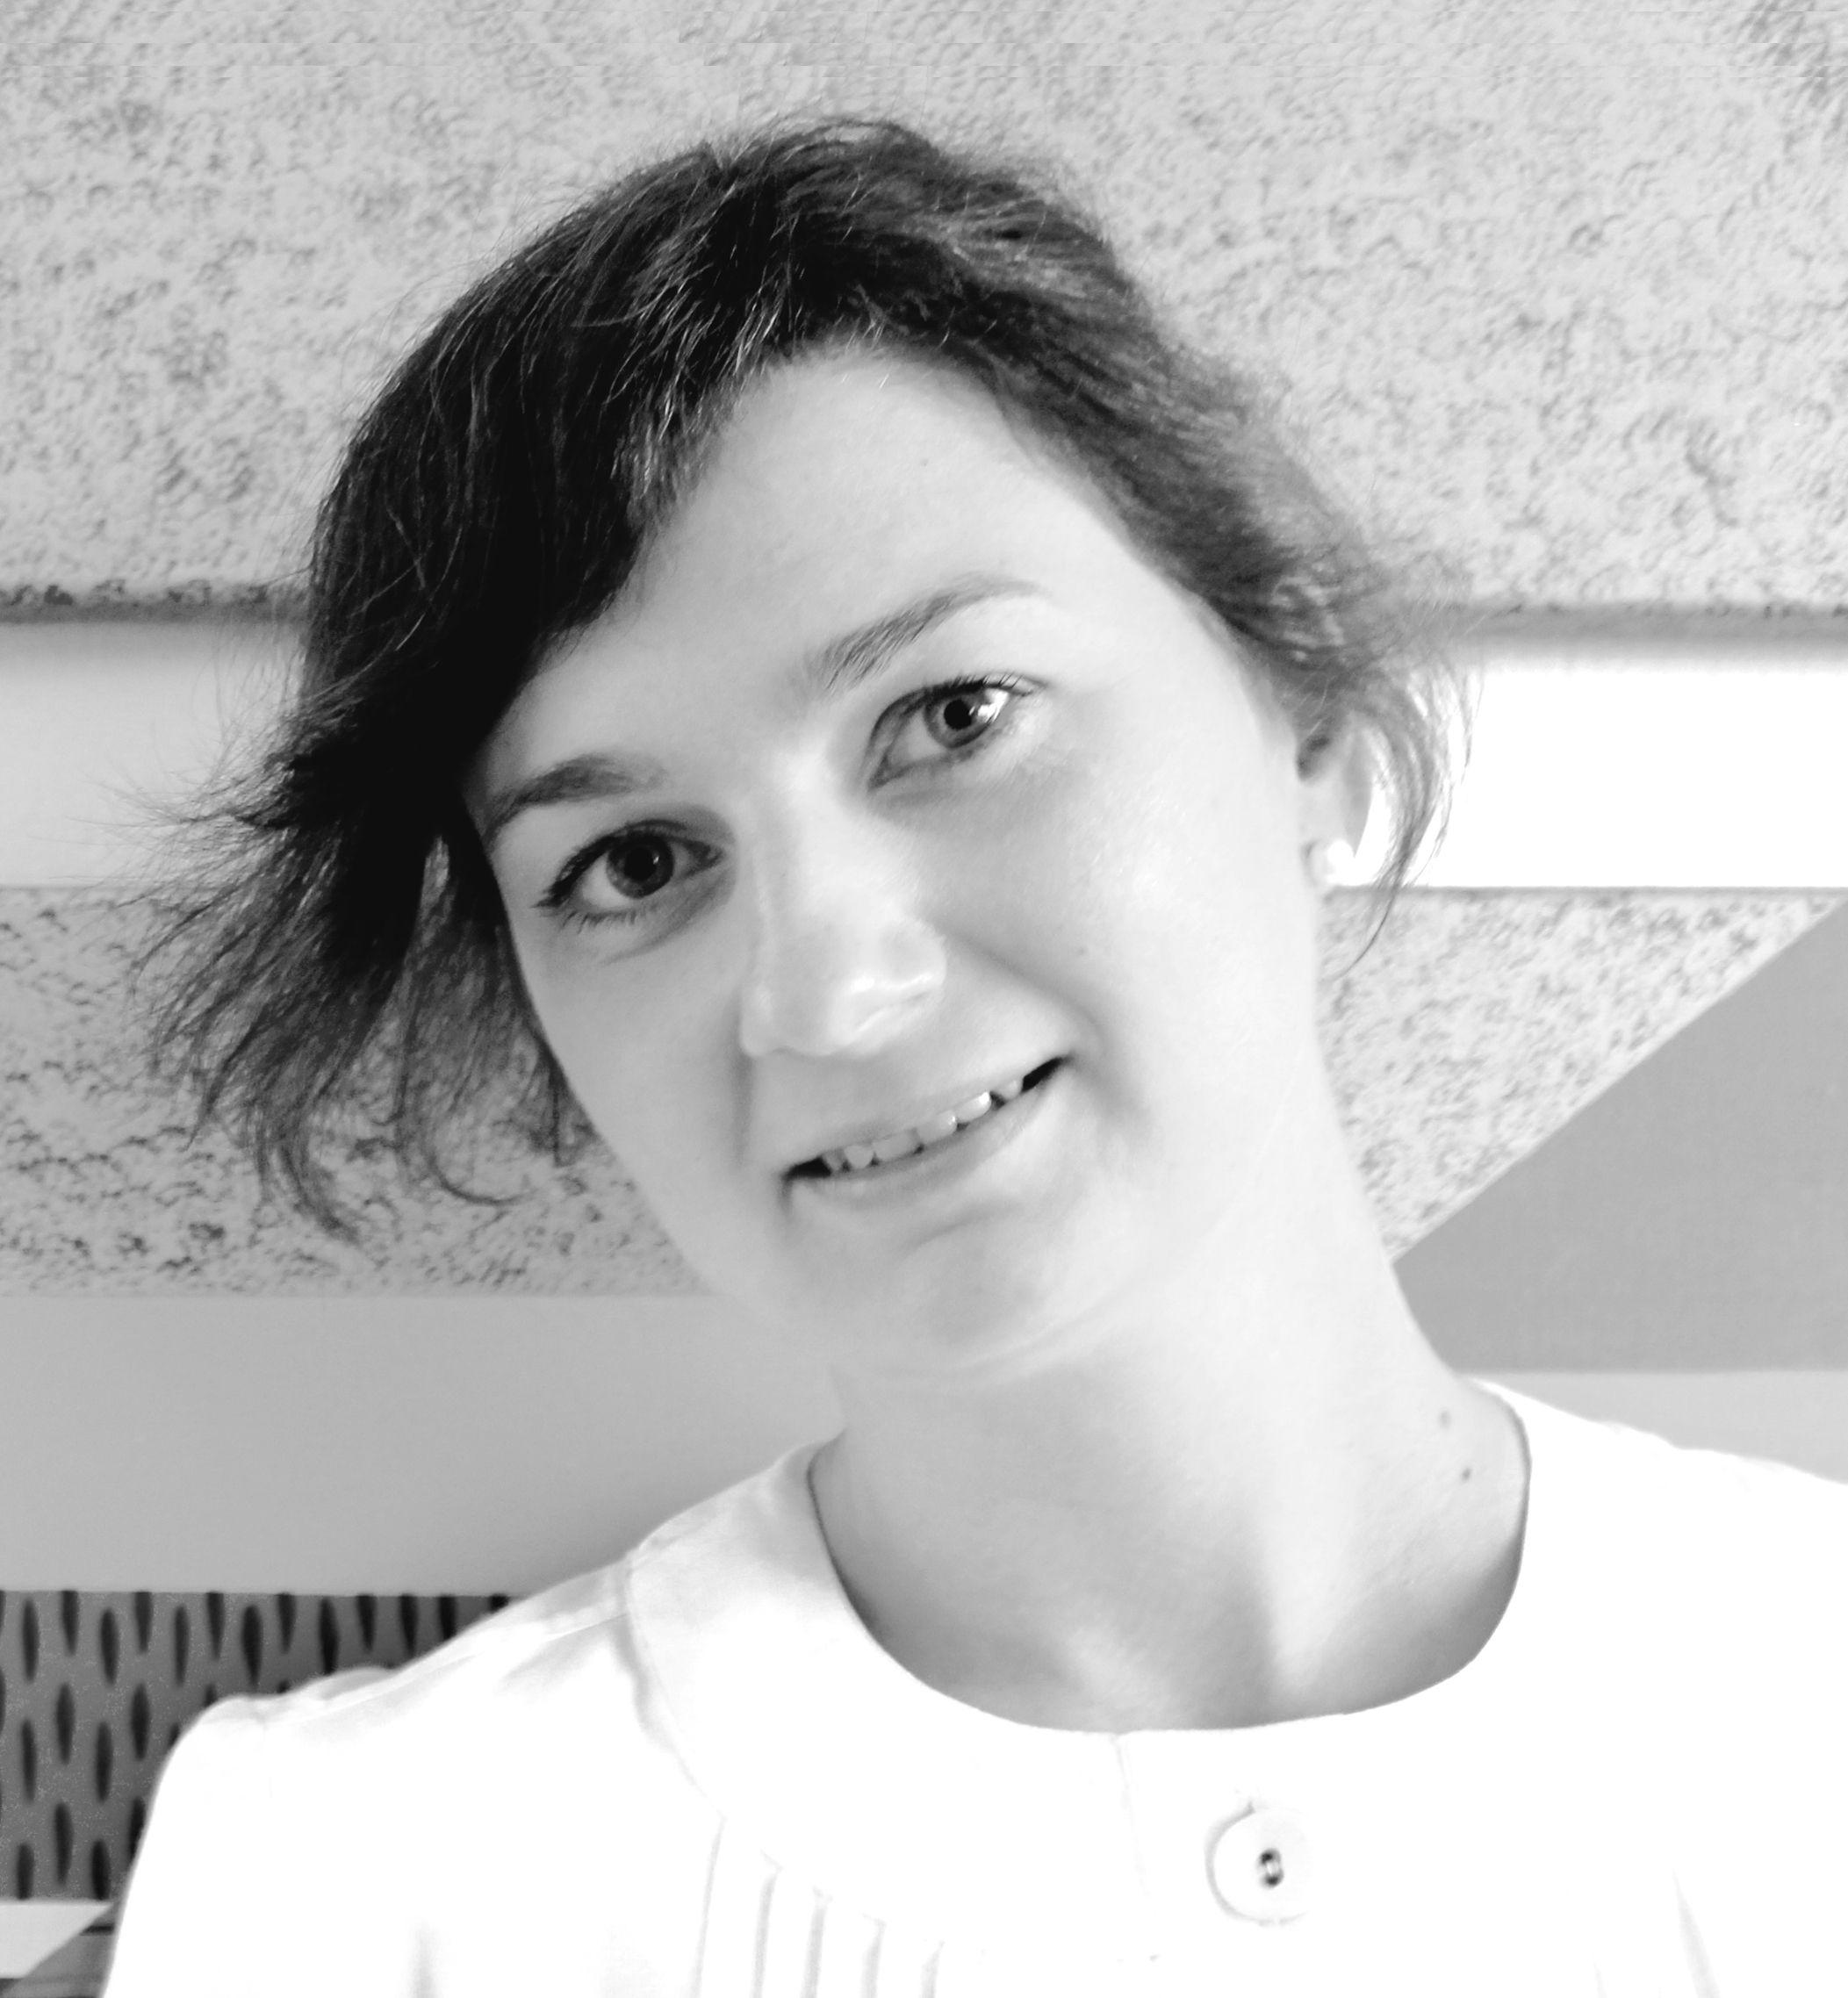 Lucie Jirku